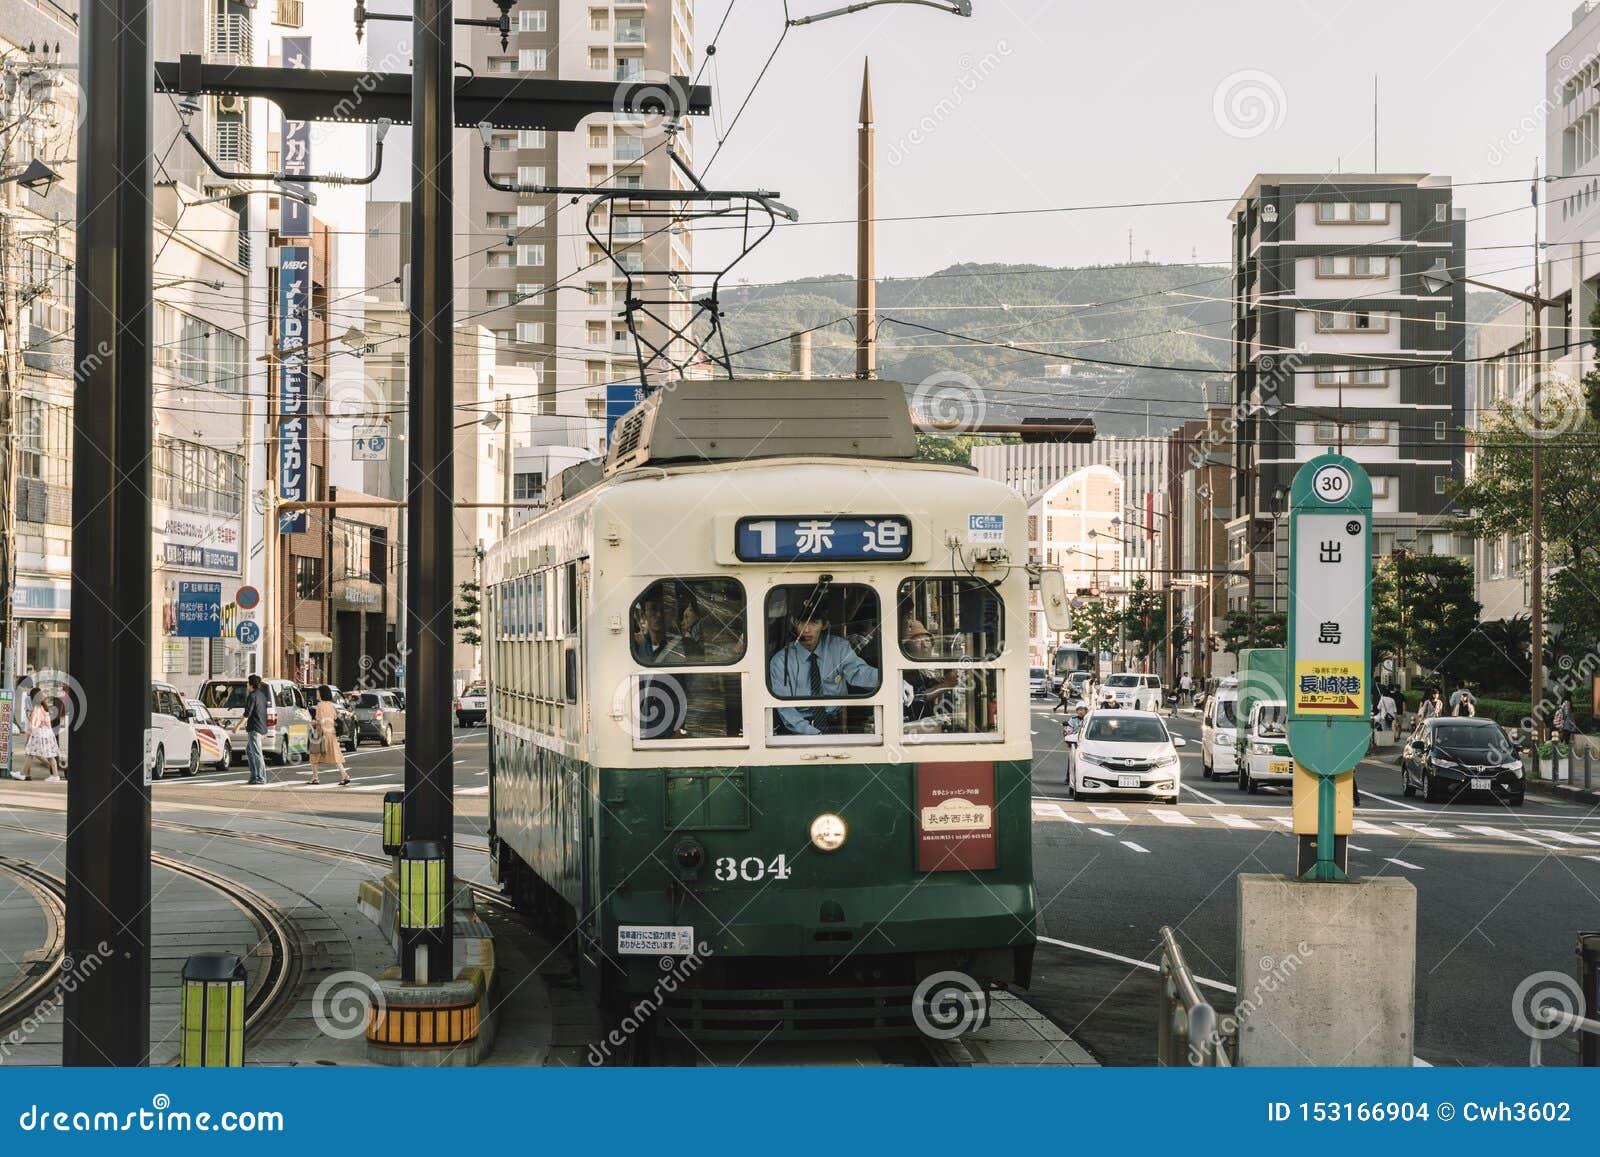 Nagasaki, Kyushu, Japan, Oost-Azië - 7 Oct 2017: Een oude overvolle tram die in het platform komt